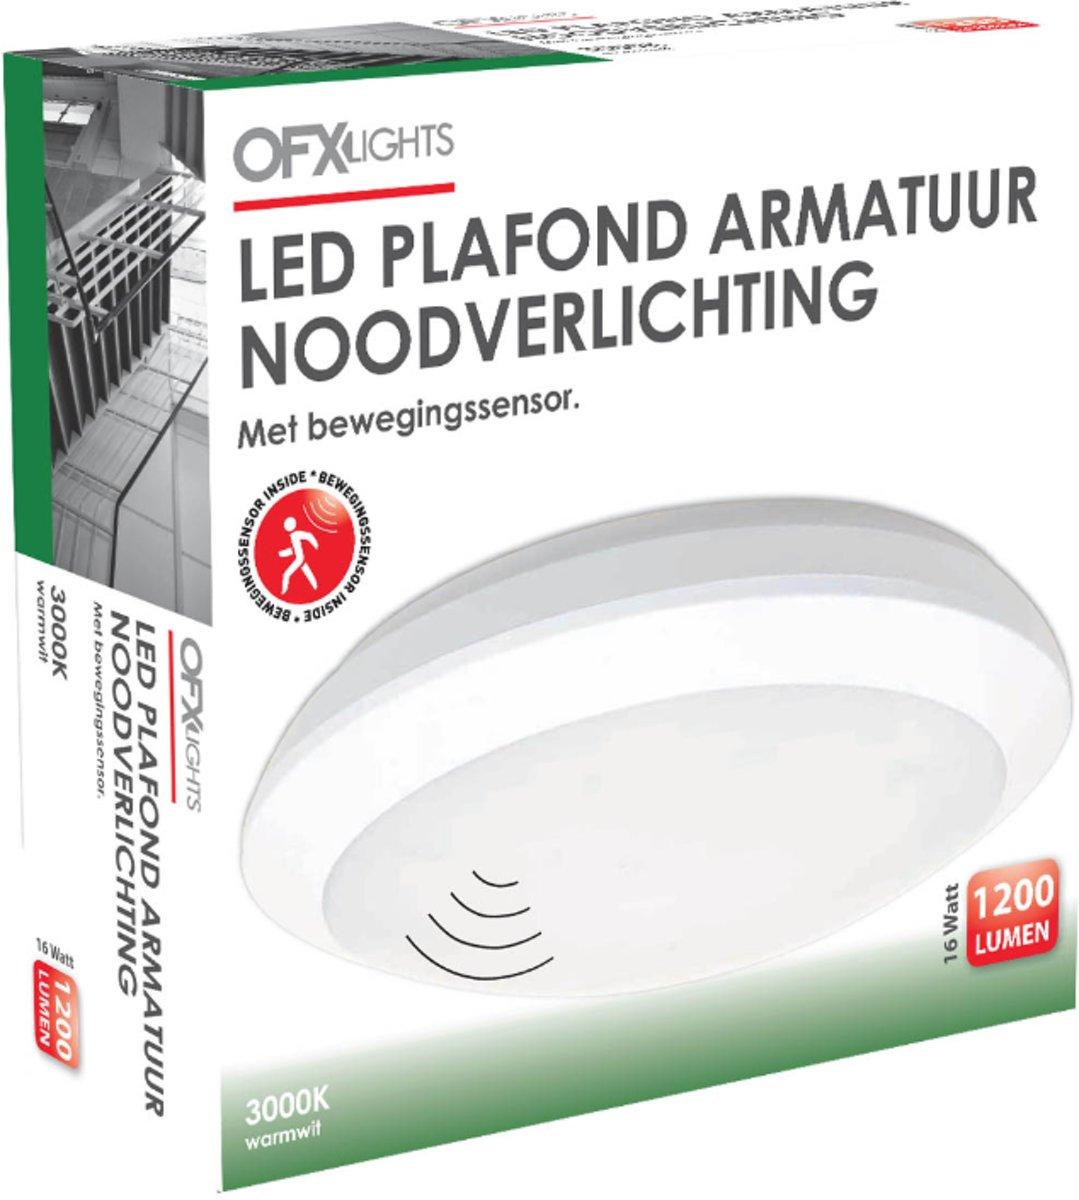 LED Plafondarmatuur + Noodverlichting 16W 3000K + SENSOR kopen